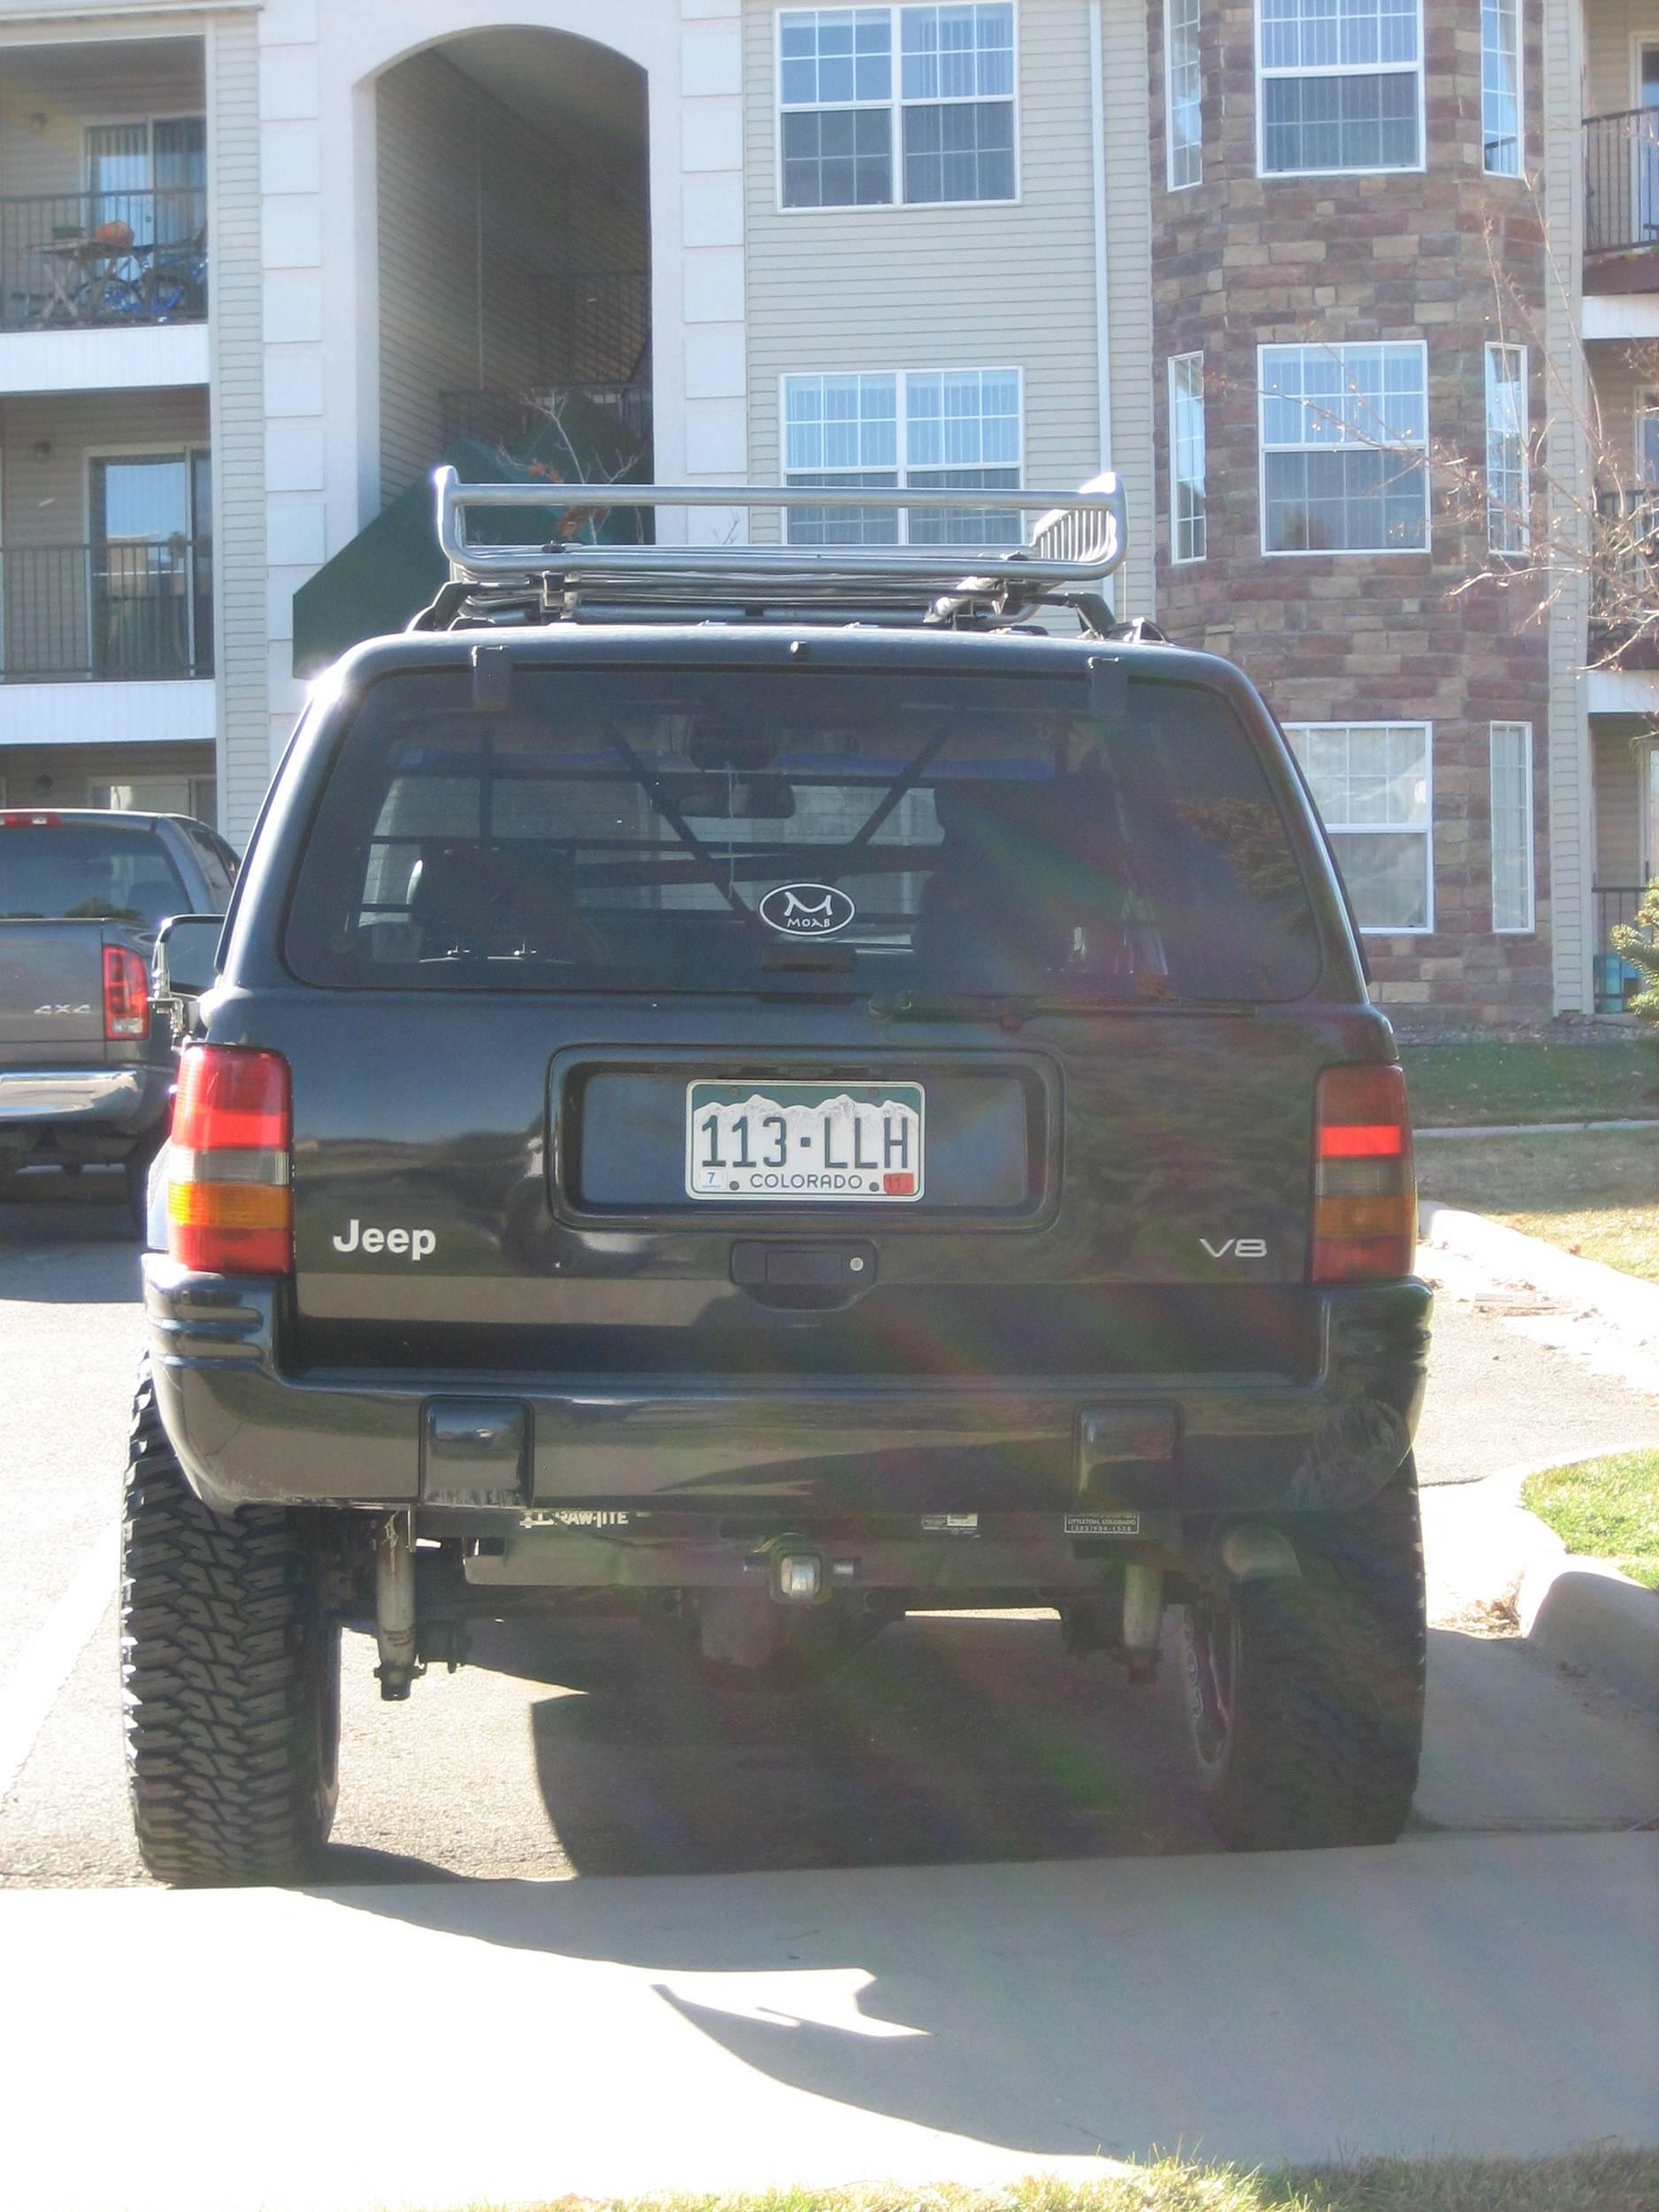 Jeep_Back2.JPG